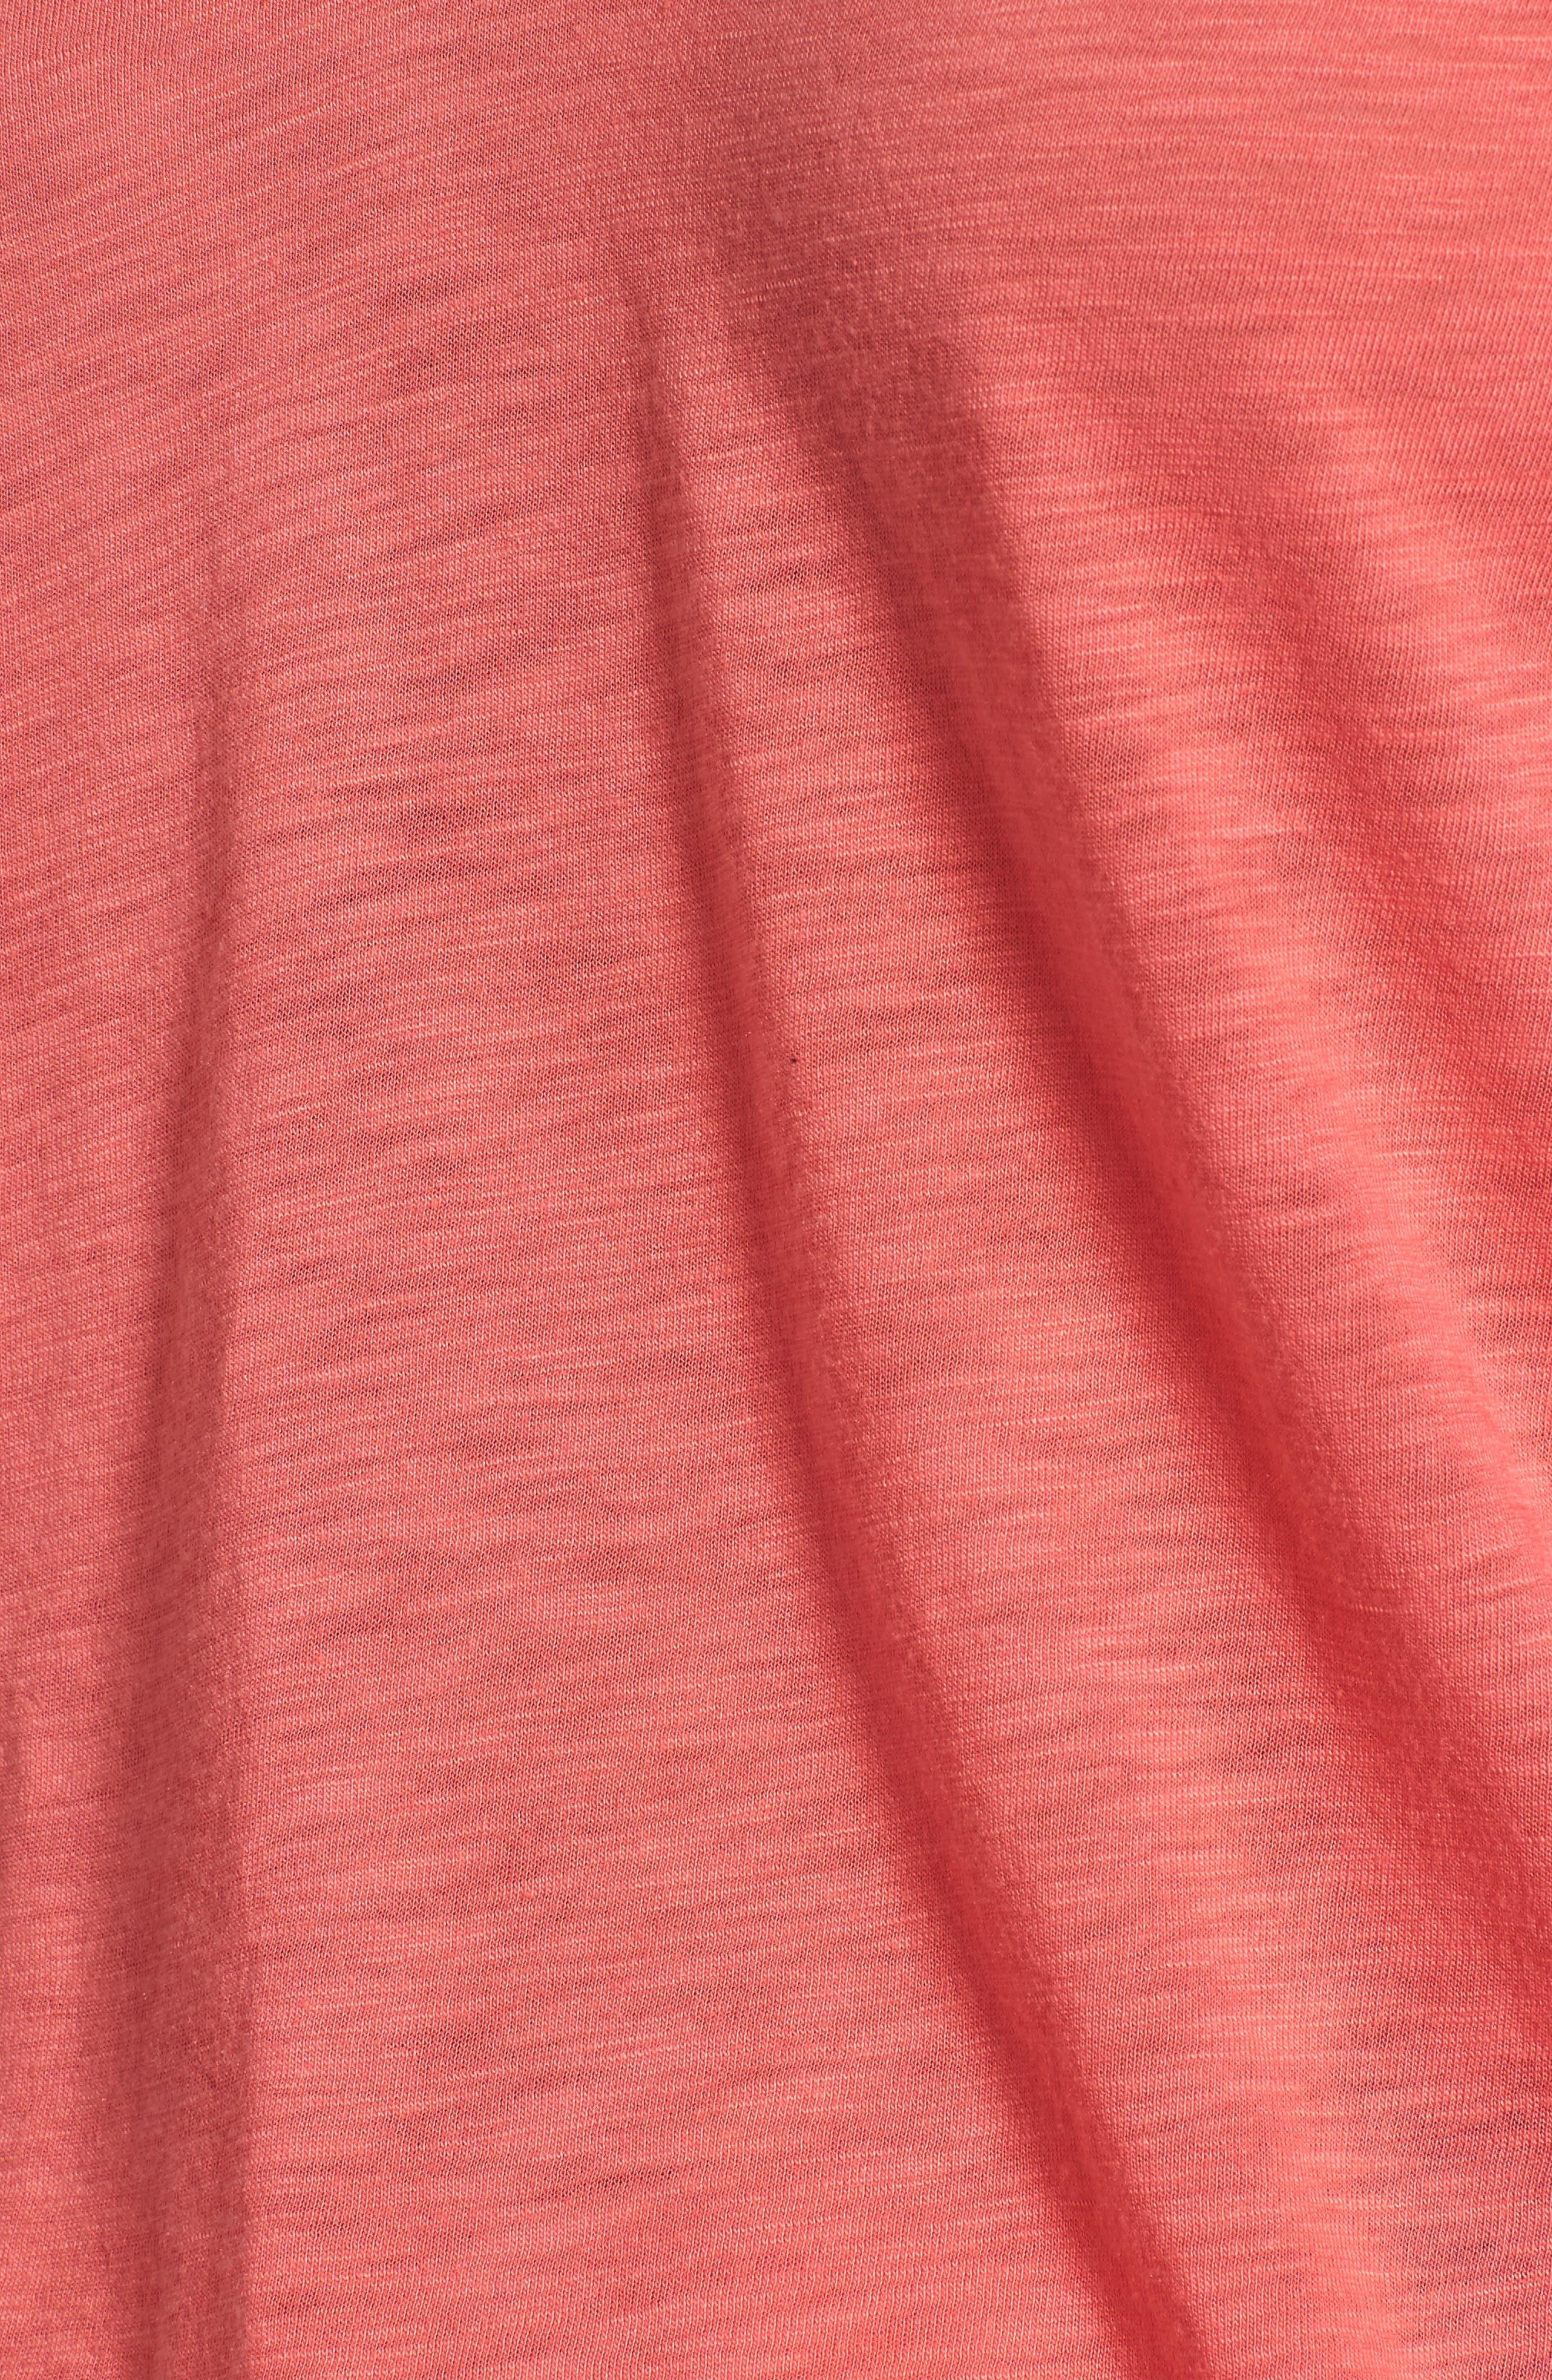 Ruffle Sleeve Tee,                             Alternate thumbnail 20, color,